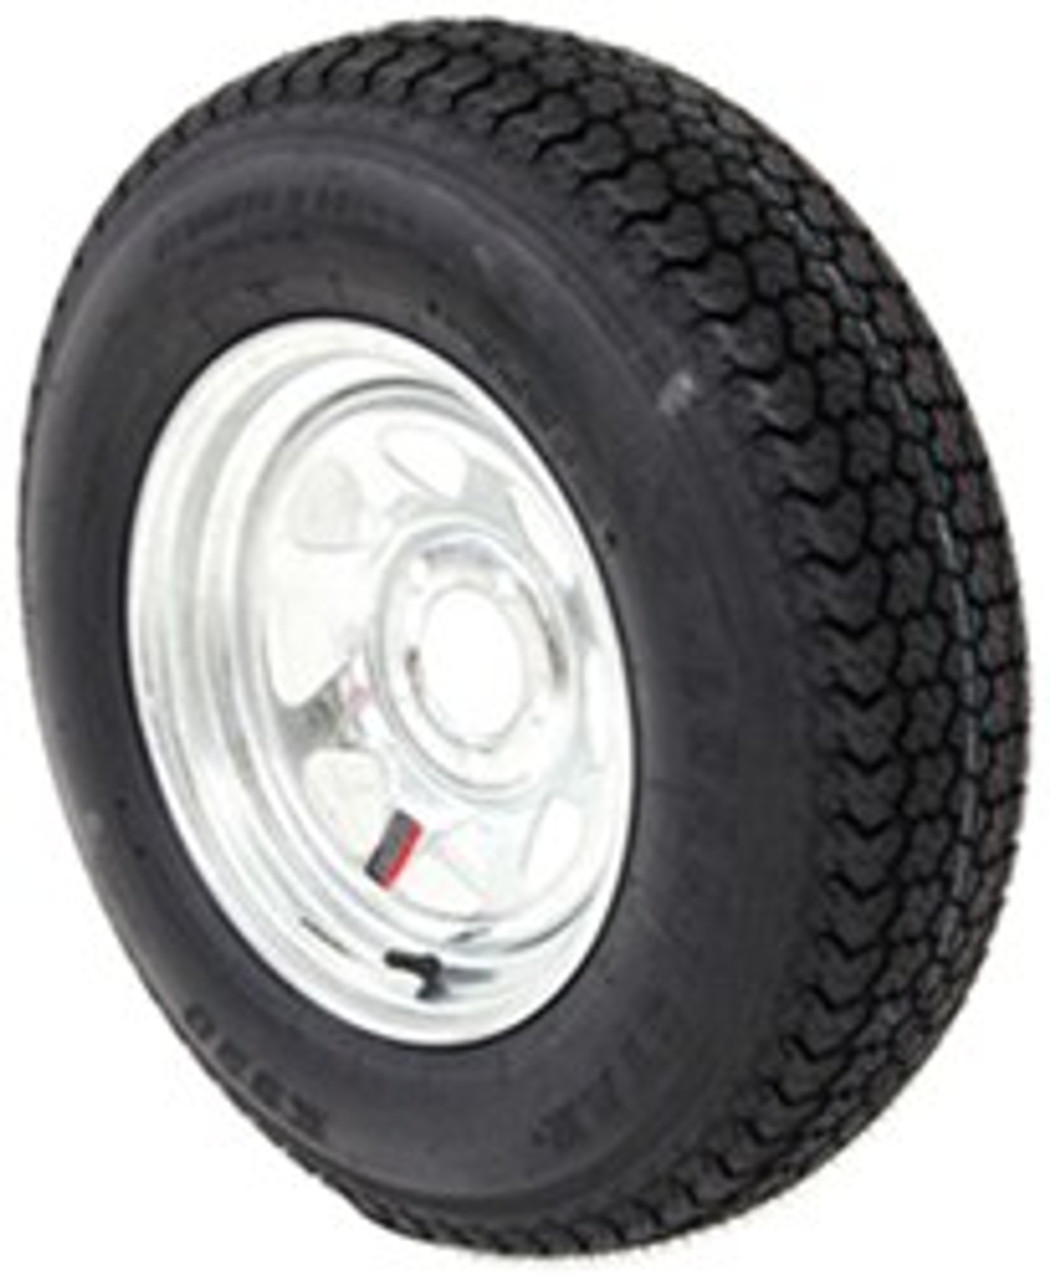 Loadstar Bias (8) Ply Tire ST205/75D15 Galvanzied Wheel 5 on 4-1/2 Load D 2150lb